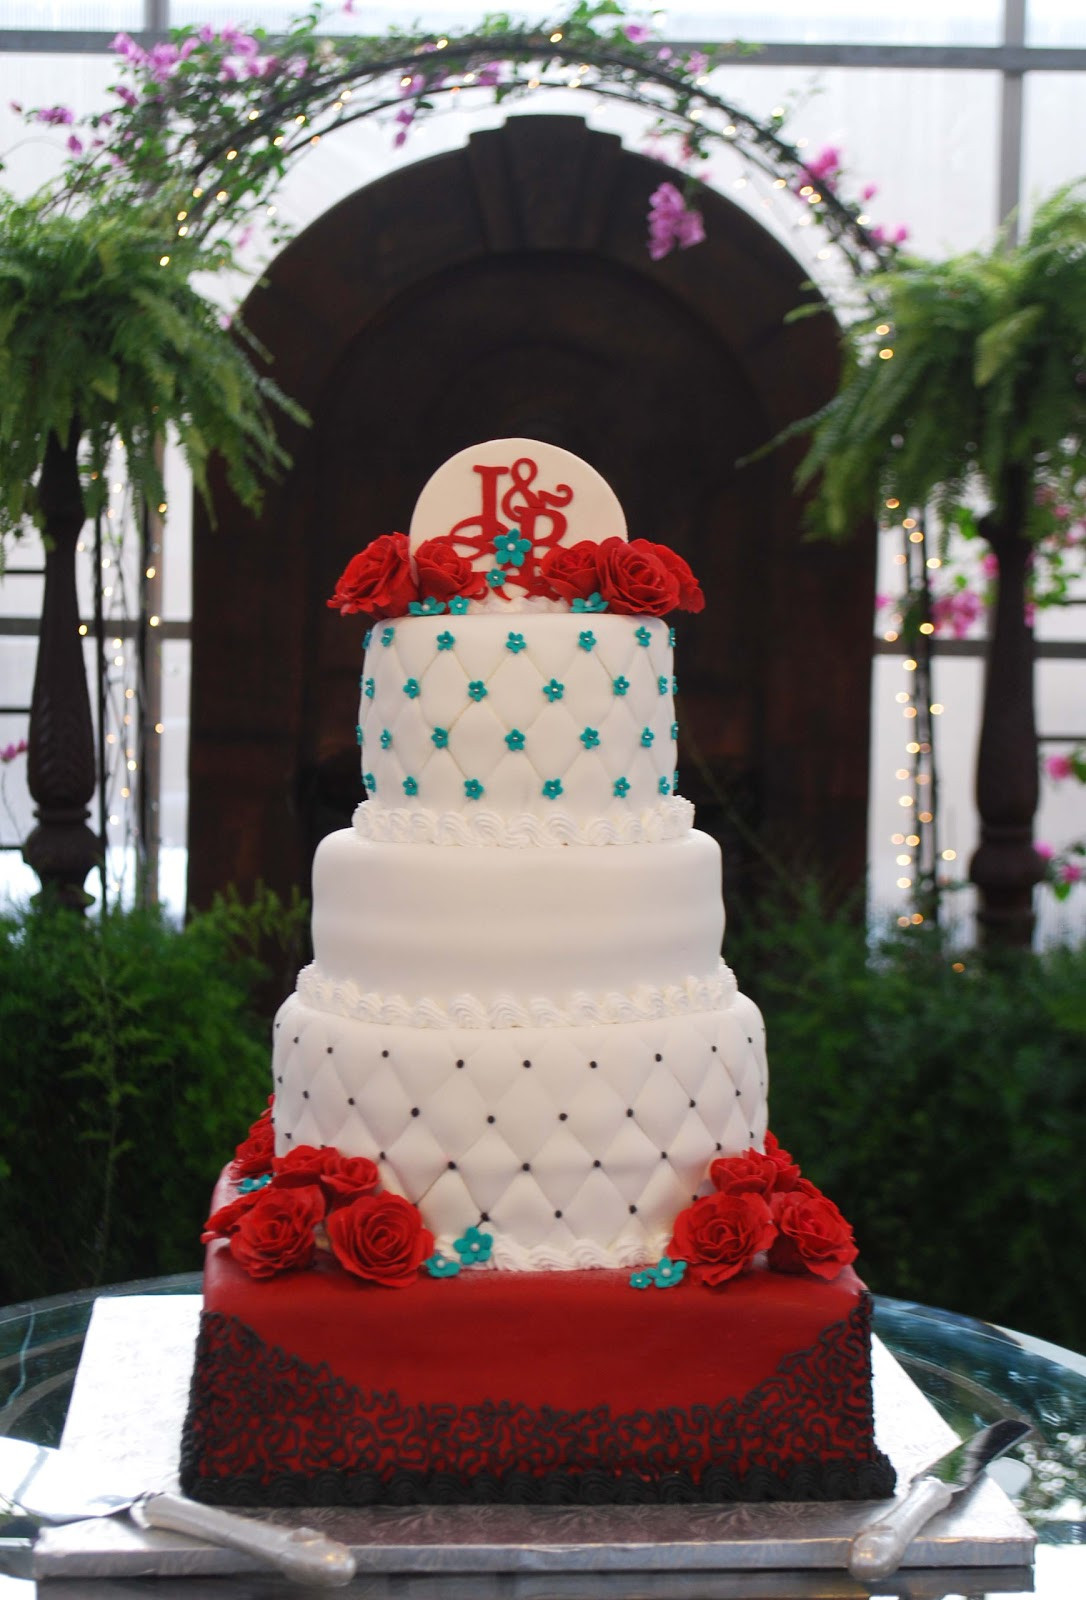 Two Layered Wedding Cakes  Benedikte s blog two layer wedding cake ideas